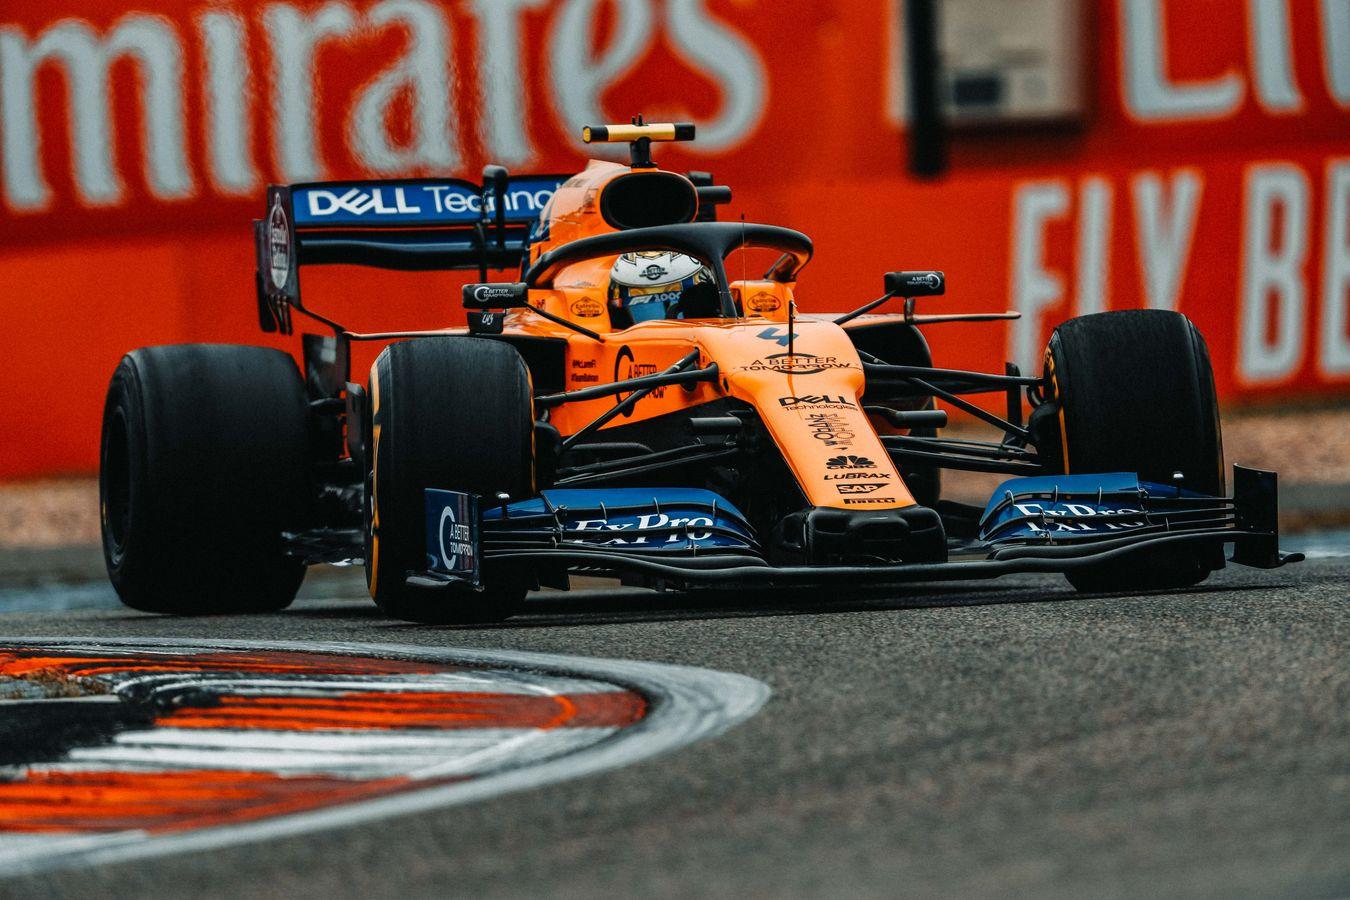 Mclaren Racing 2019 Chinese Grand Prix